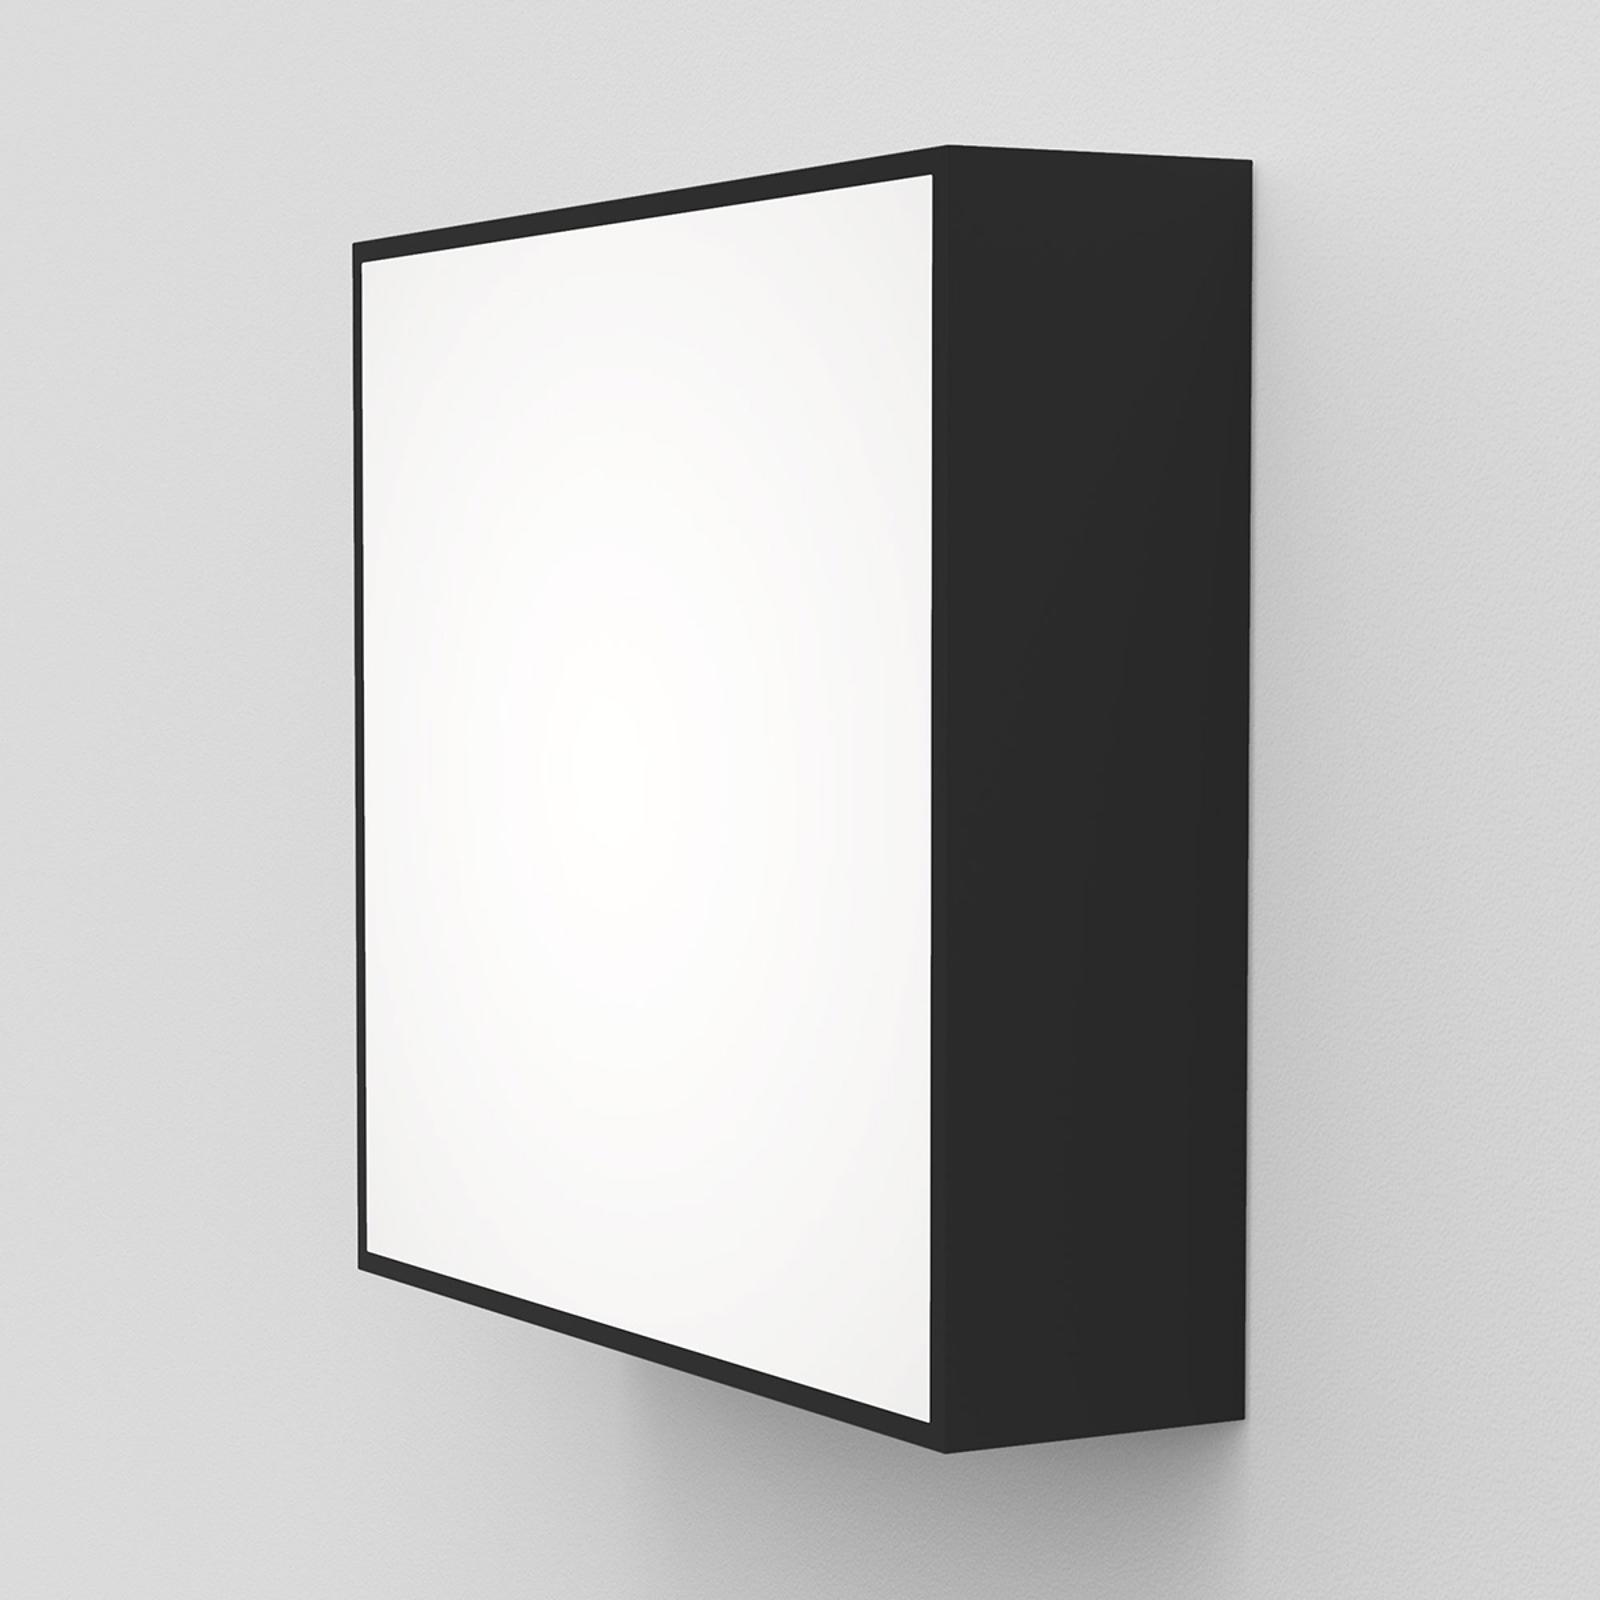 Astro Kea Square 240 LED-Wandleuchte schwarz